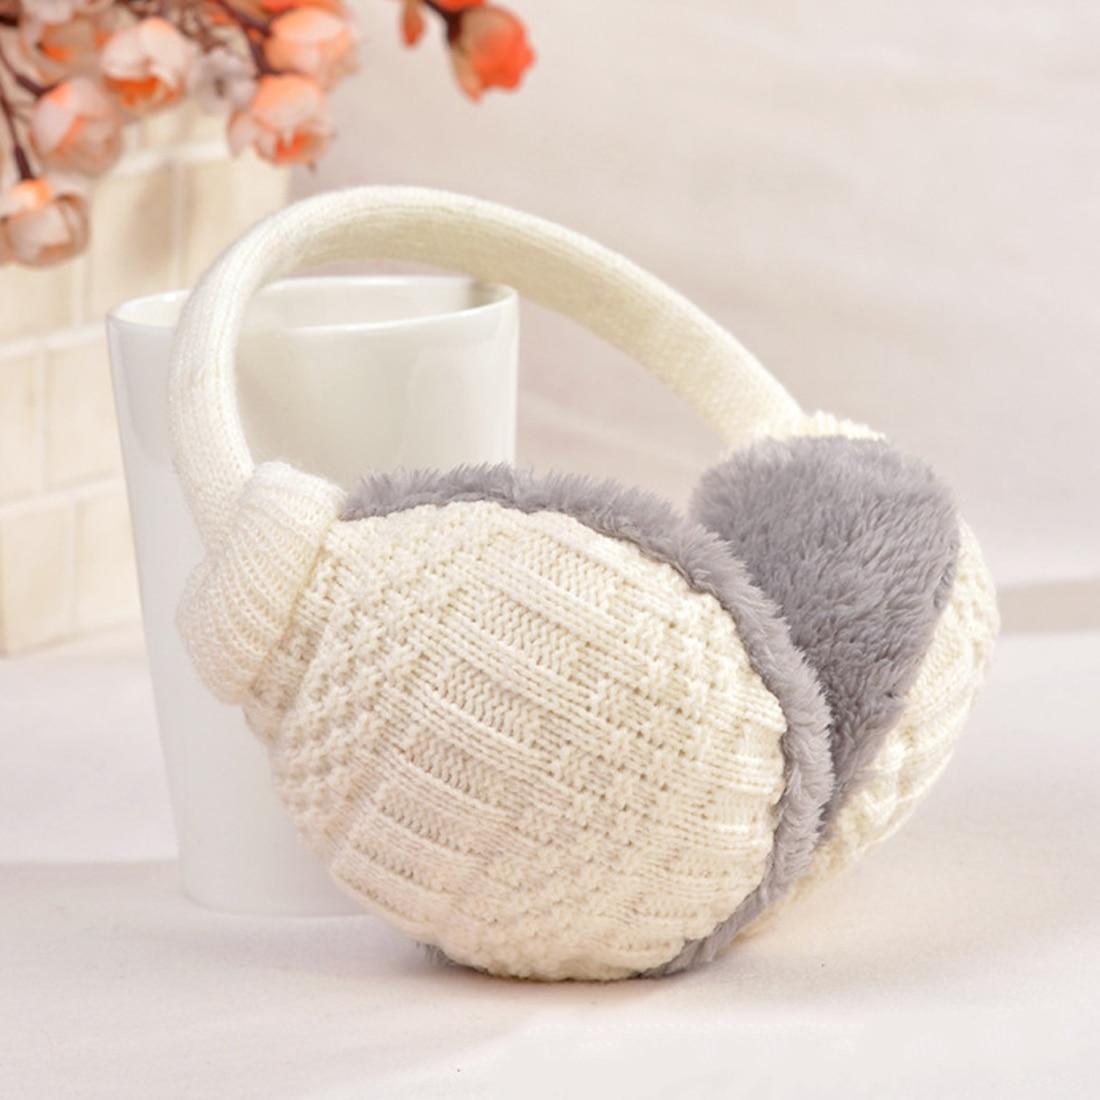 Ear Cover Women Winter Warm Plush Knitted Cotton Earmuffs Fashion Girls Plush Earlap Warmer Headband Accessories